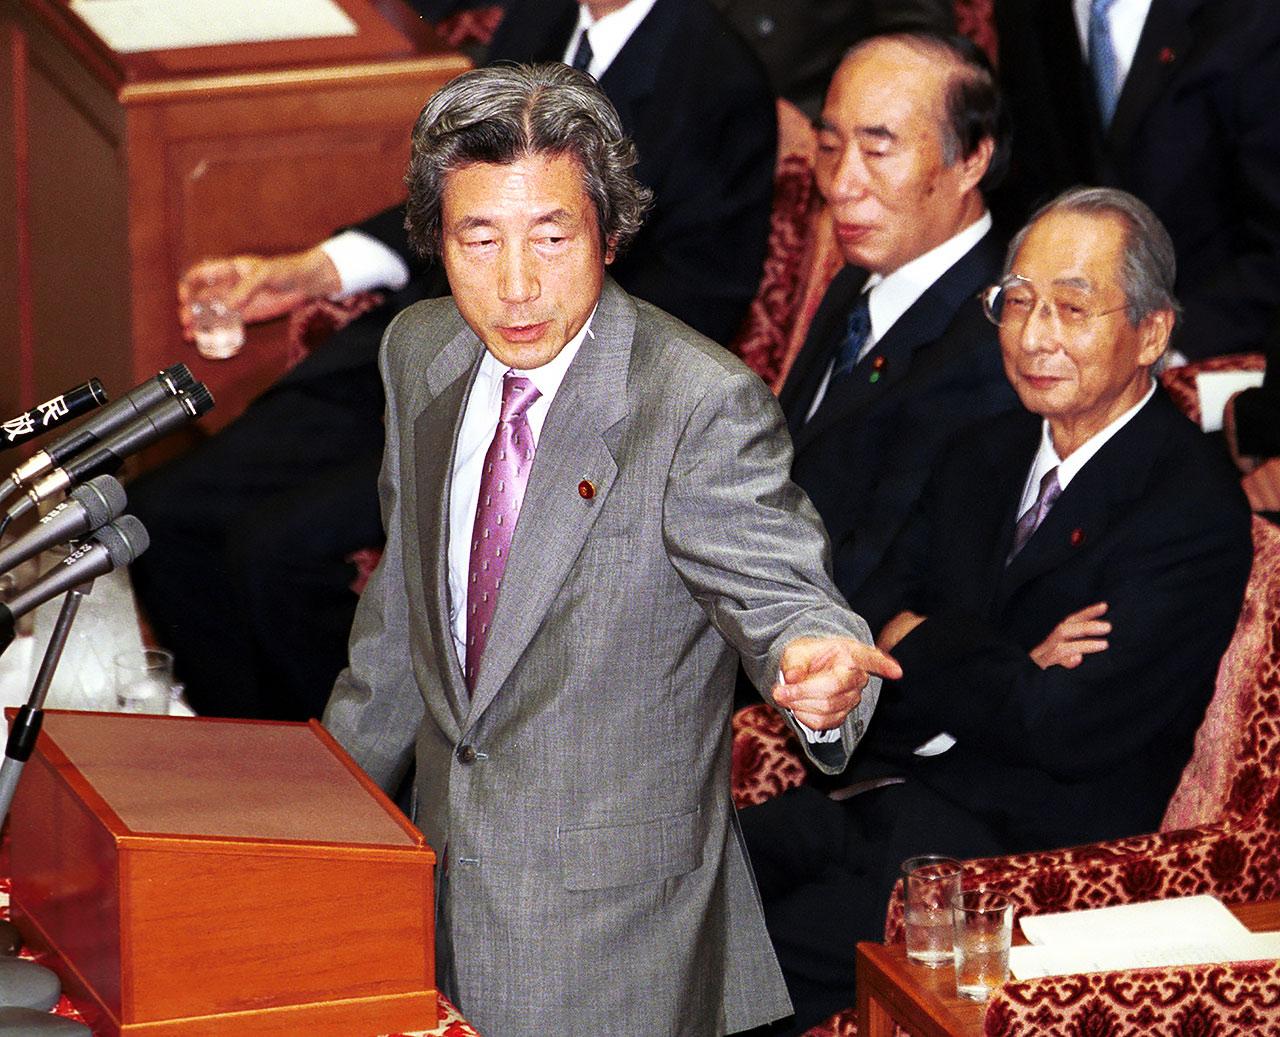 首相時代の小泉純一郎氏=2001年6月(写真:Getty Images)